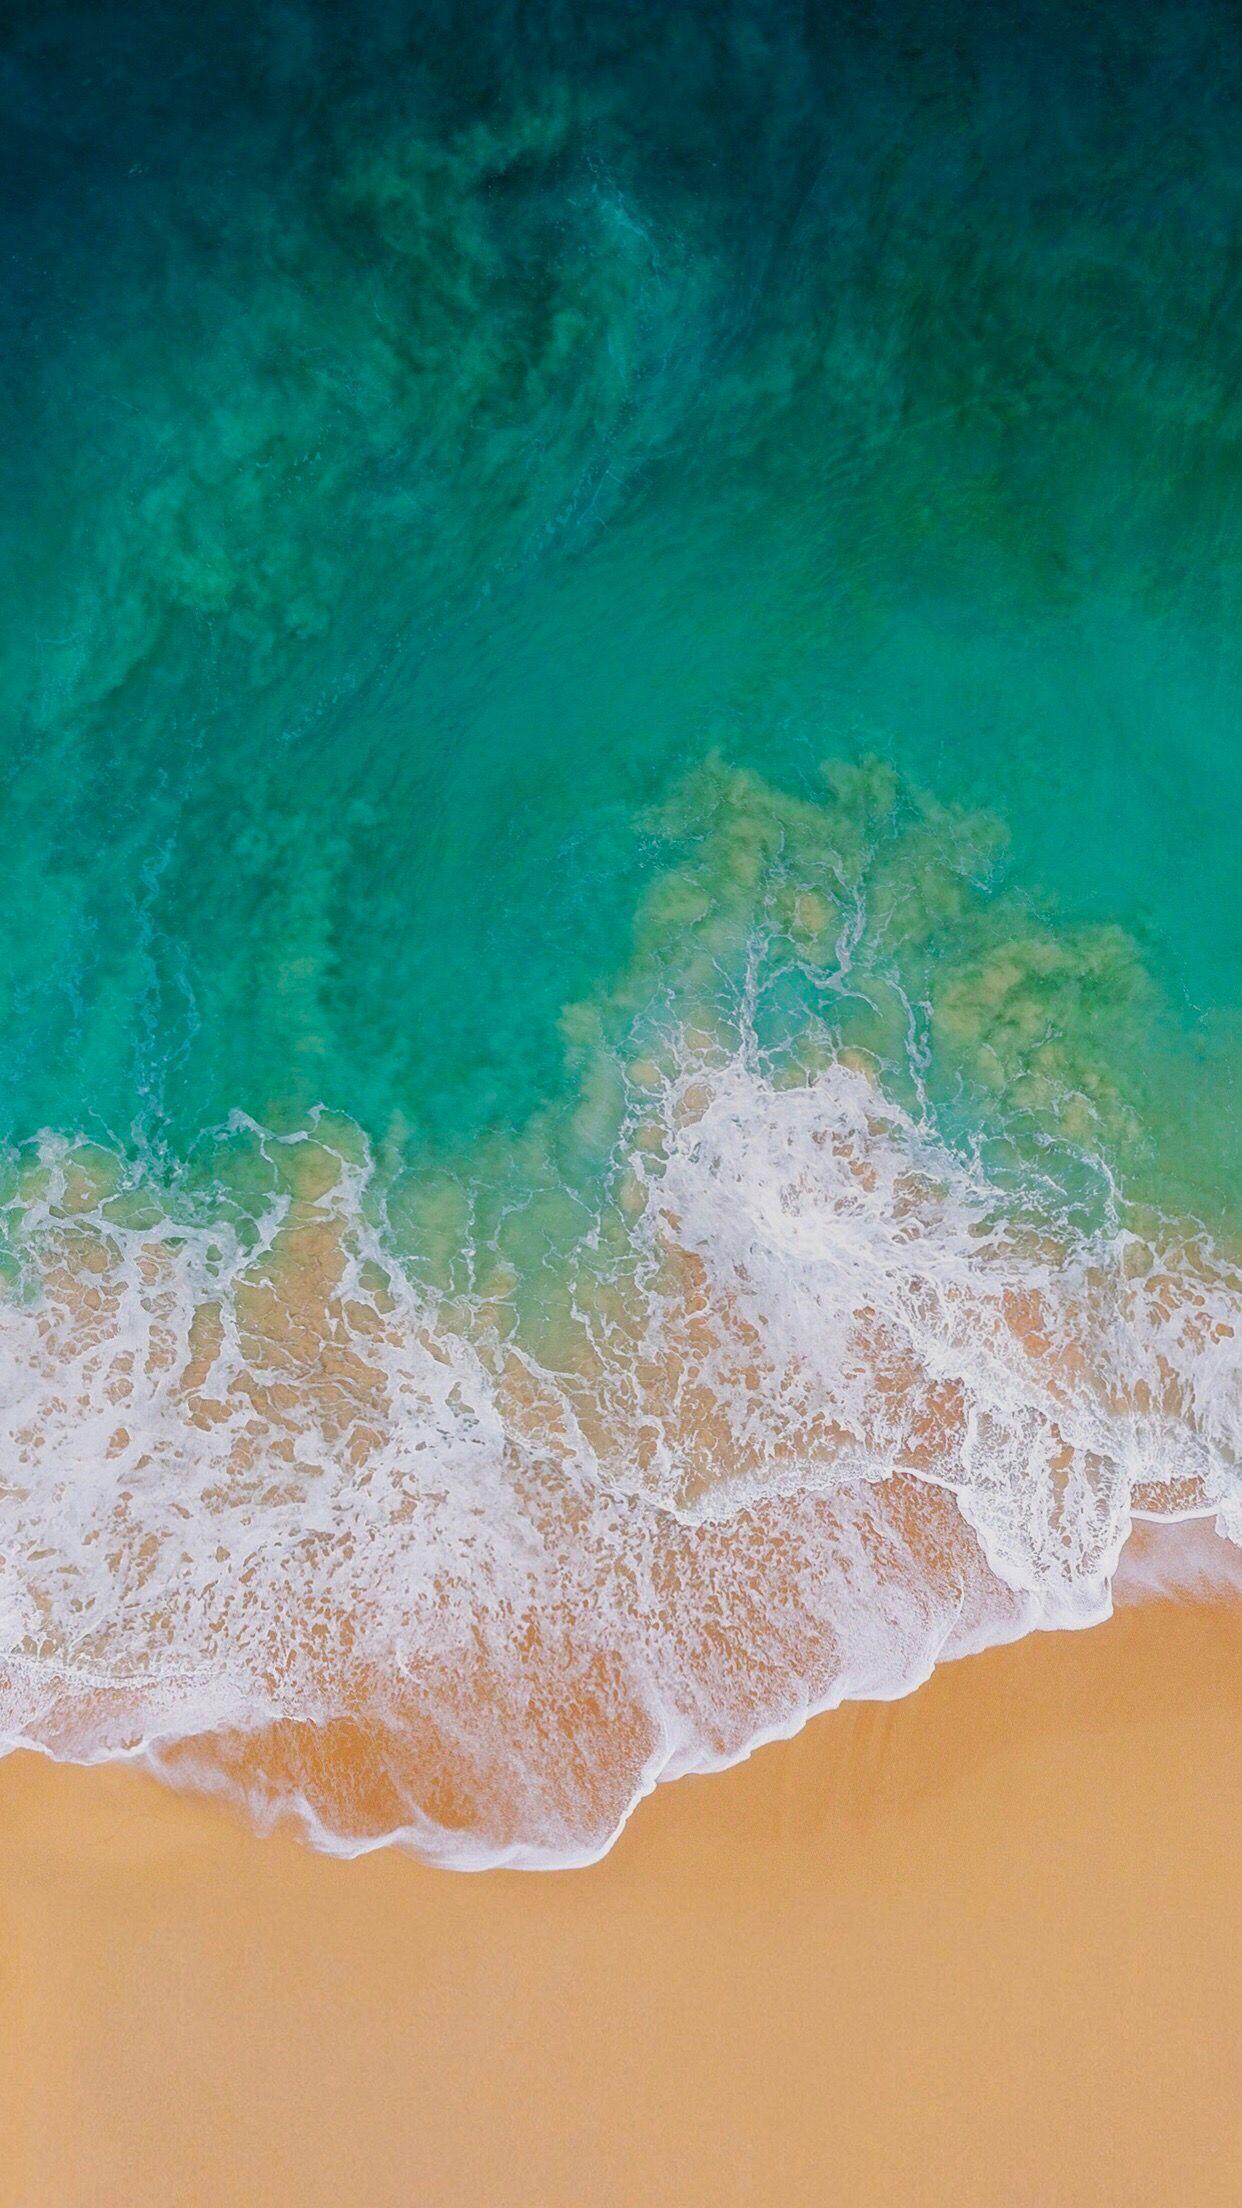 Beach Sand iPhone Wallpapers   Top Free Beach Sand iPhone ...